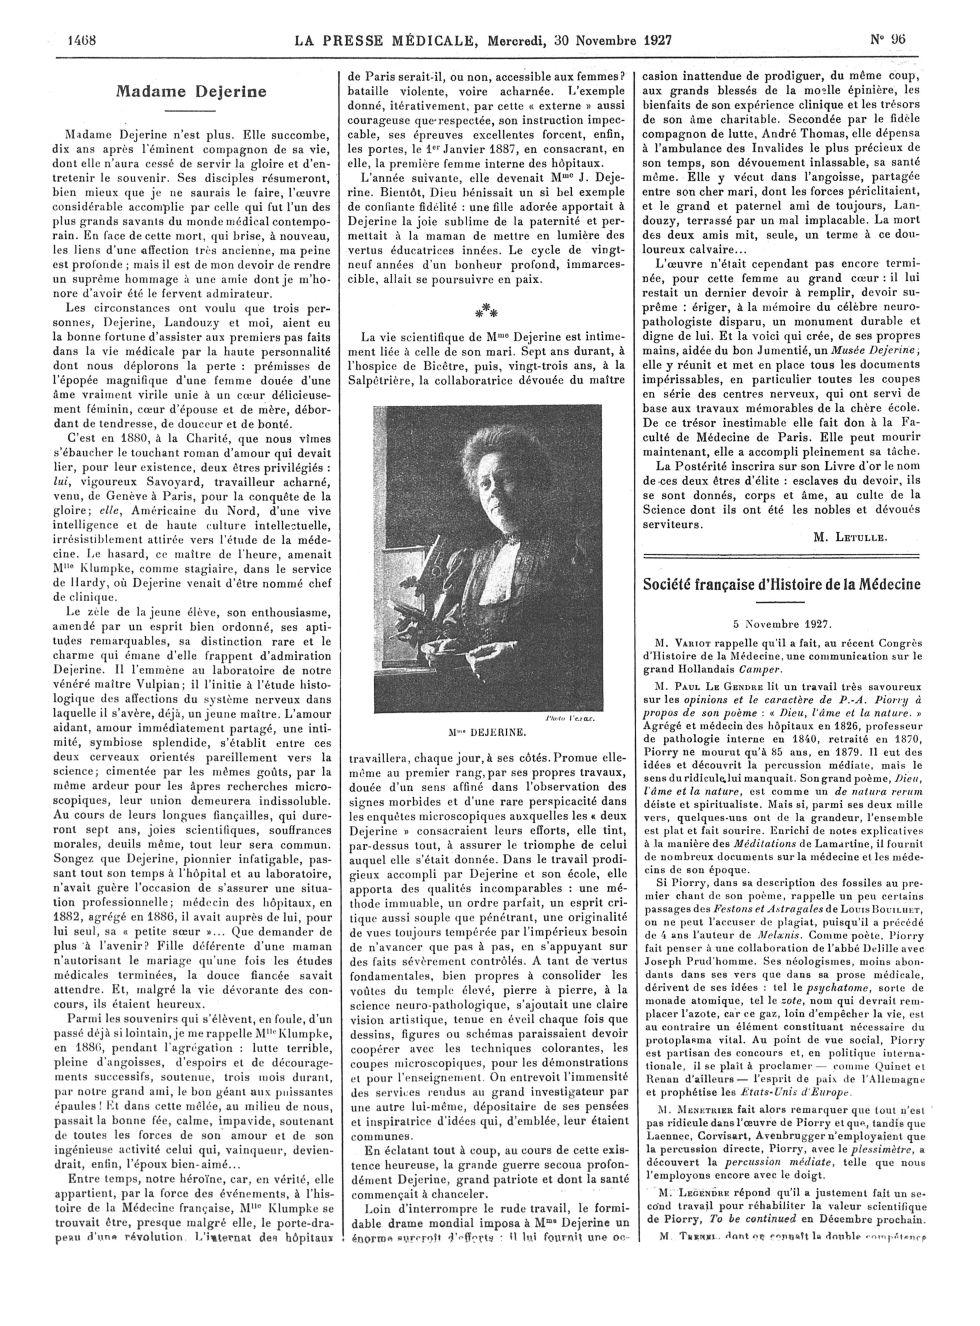 Mme Dejerine - La Presse médicale - [Articles originaux] -  - med100000x1927xartorigx1476